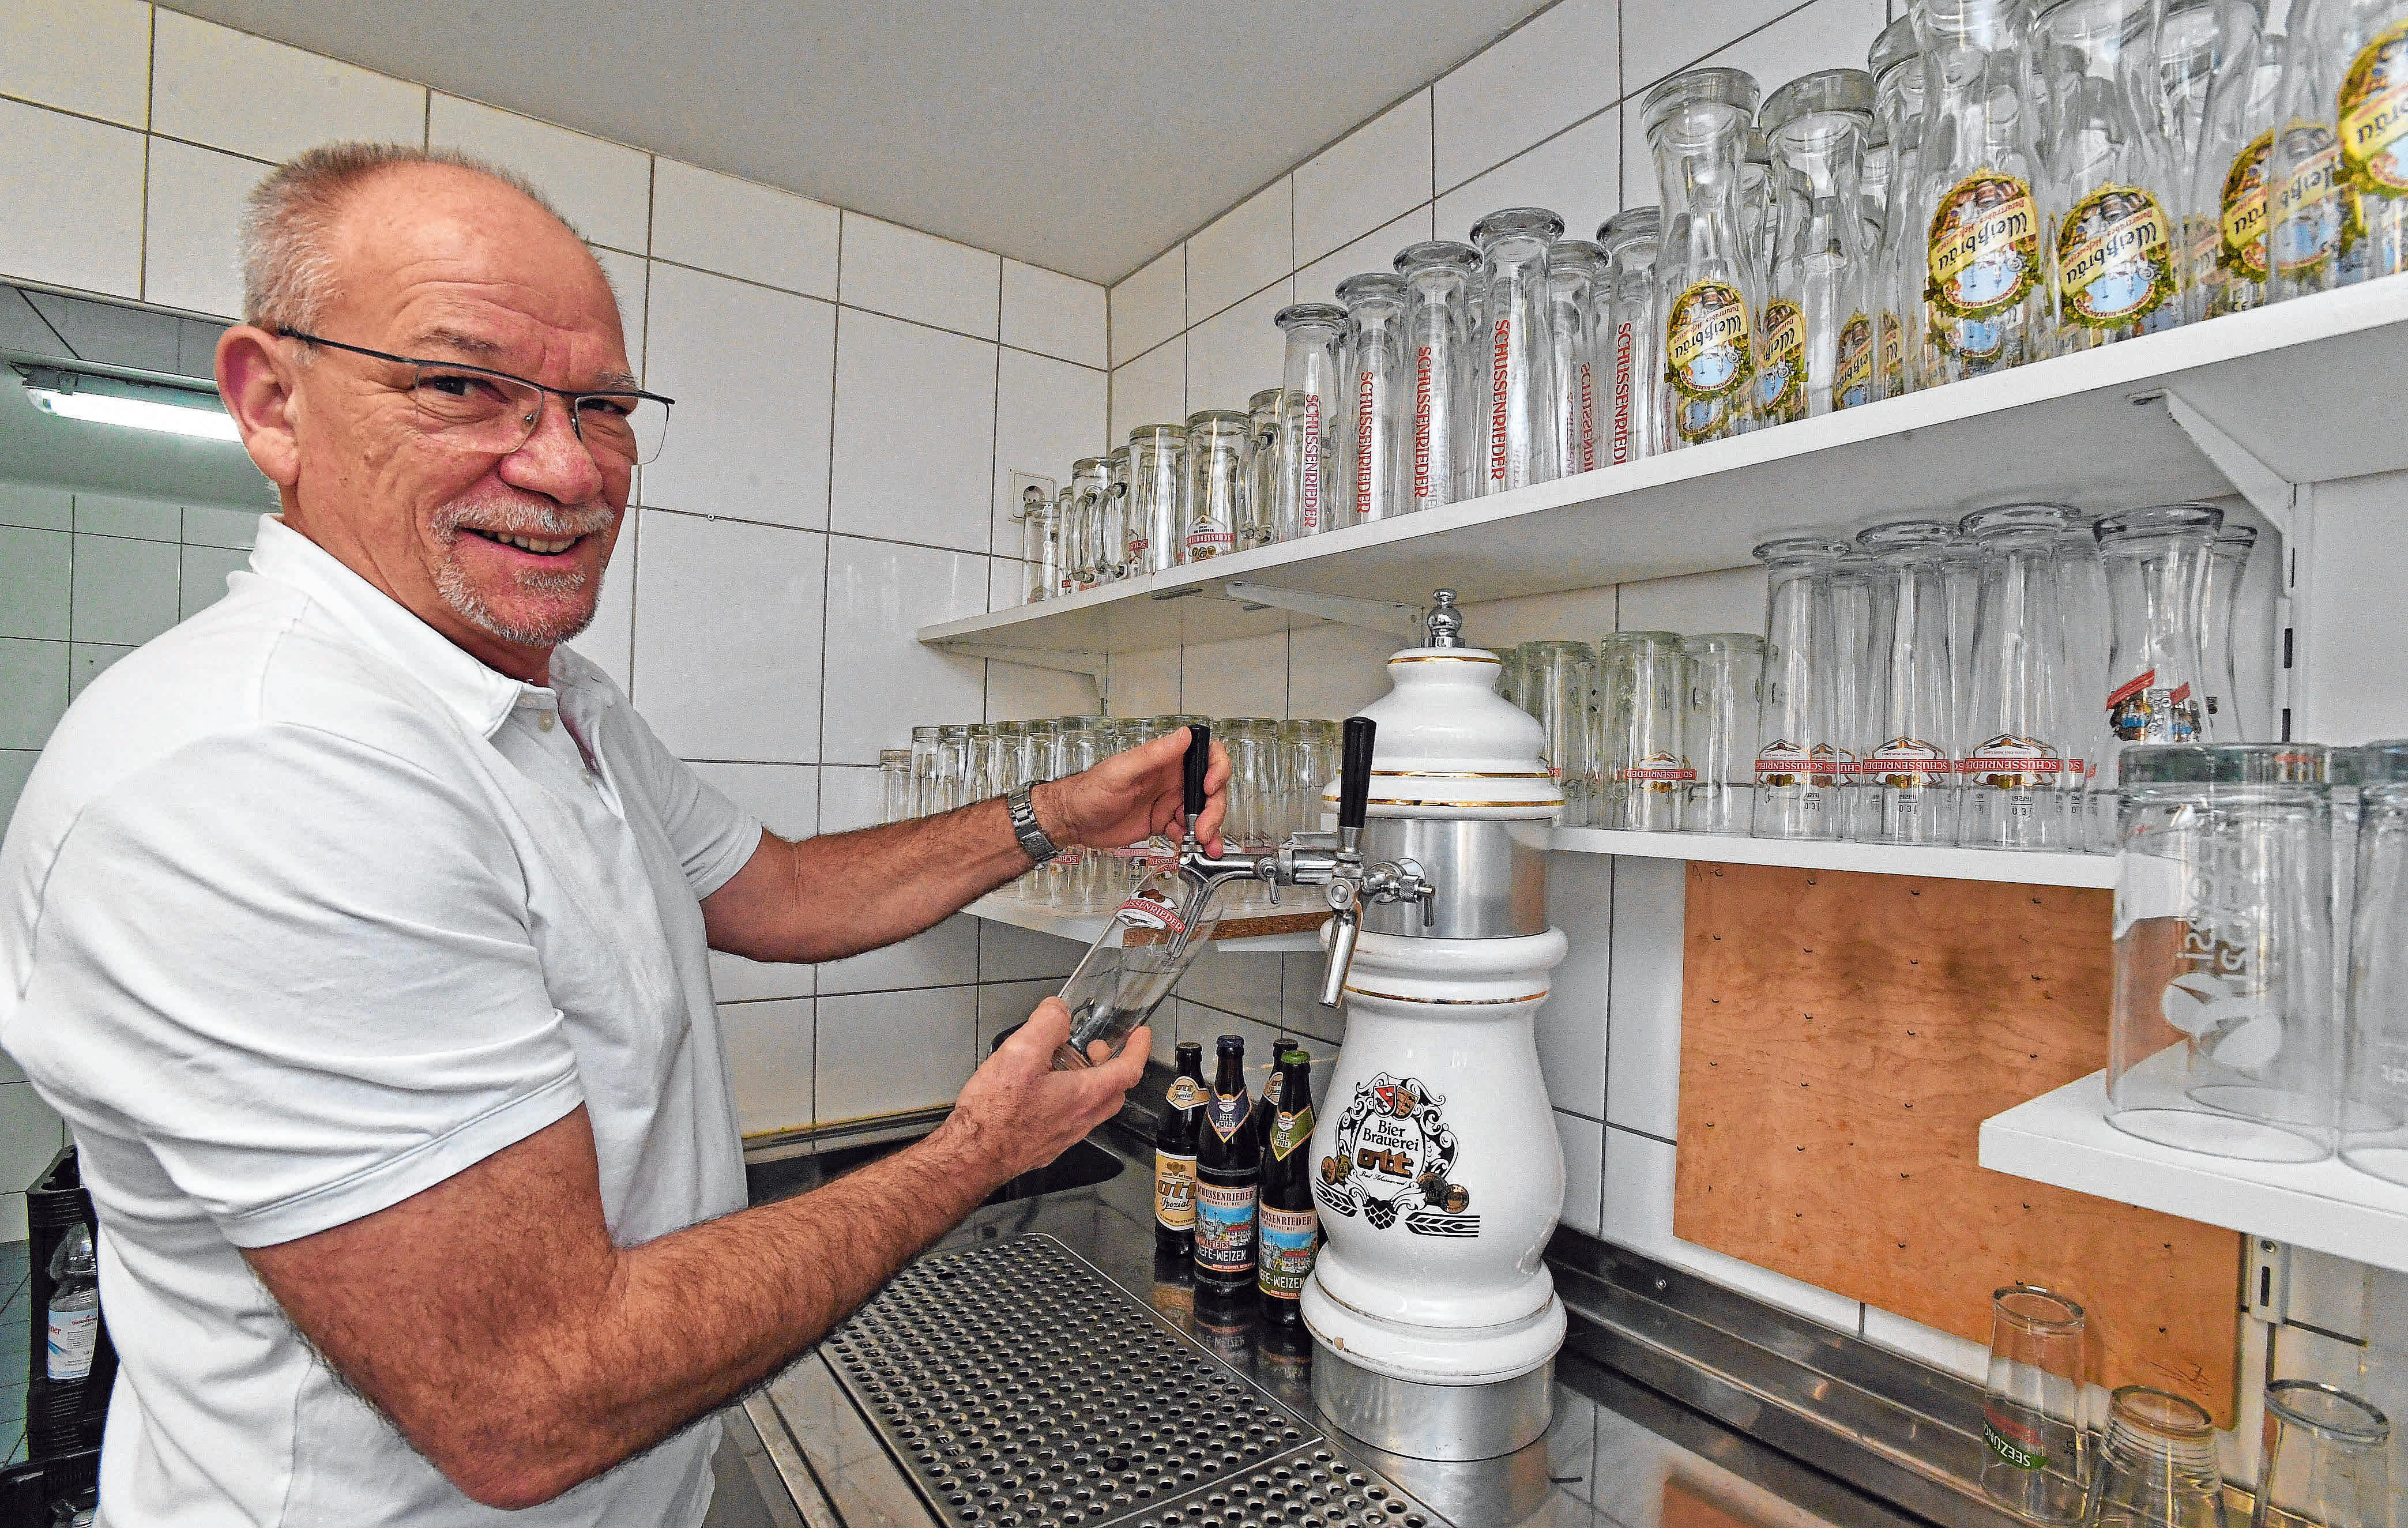 Der Chef selber zapft Bier.